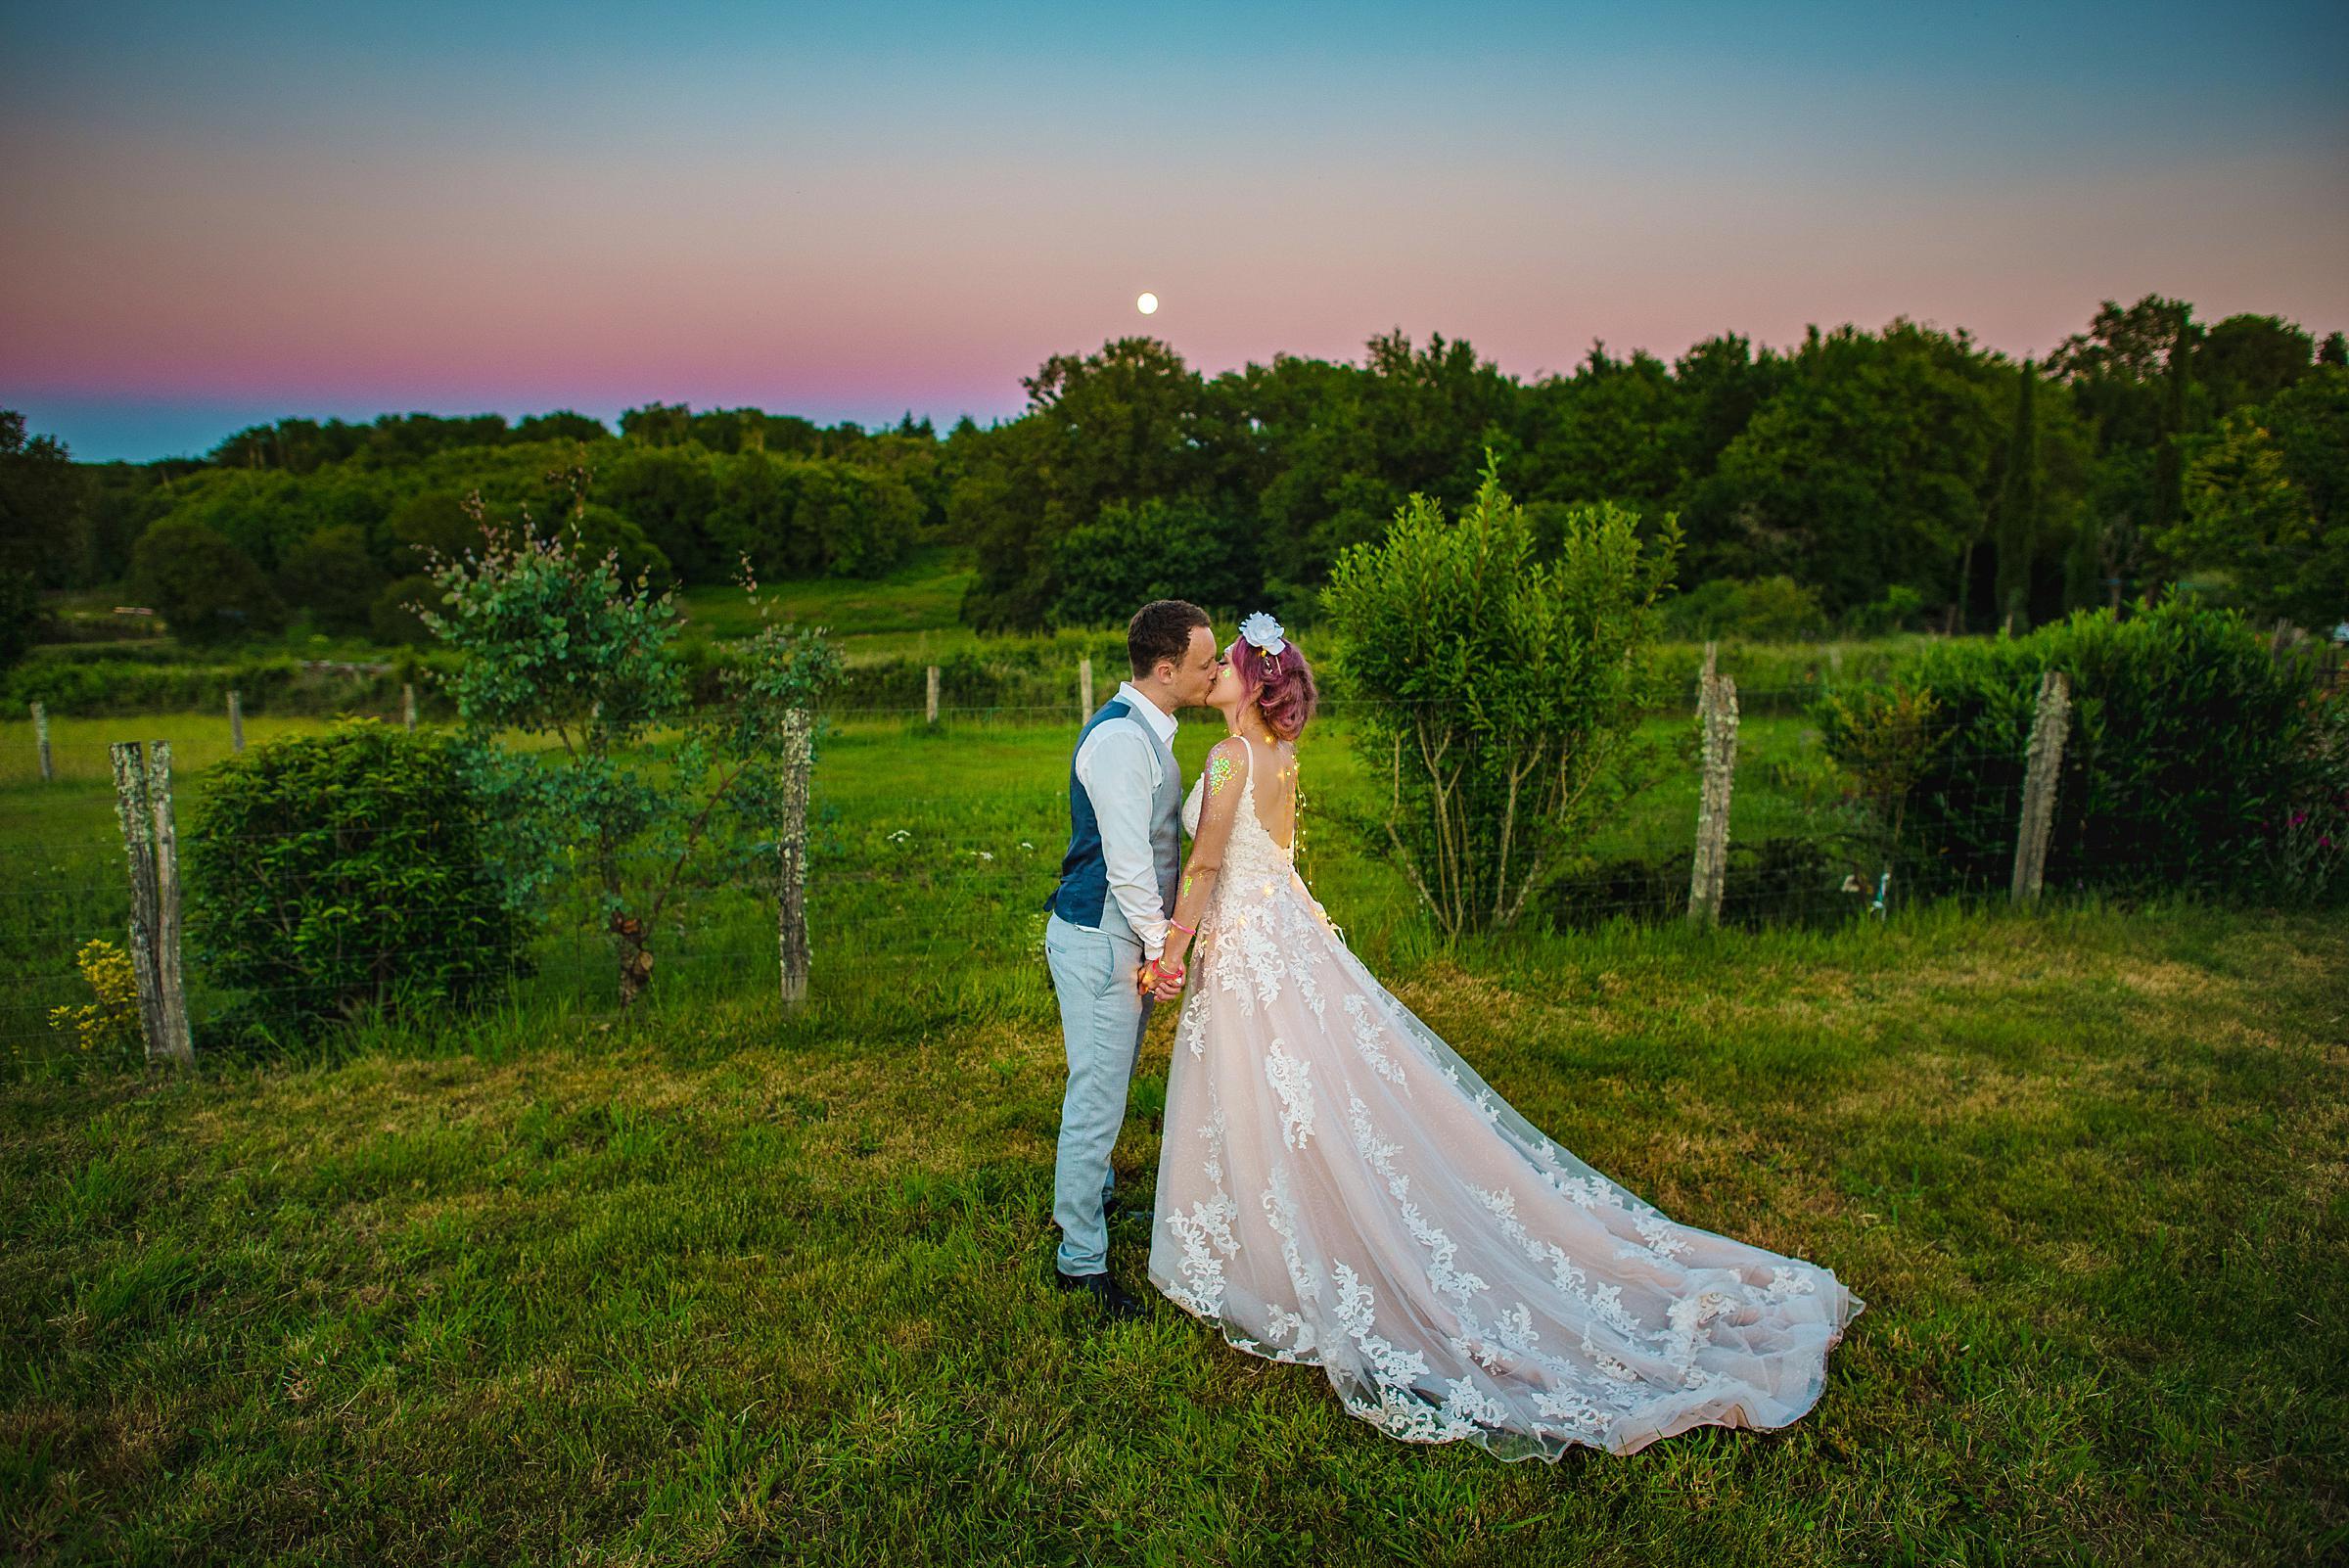 Back Garden Festival Wedding in France - Destination Wedding Photographer